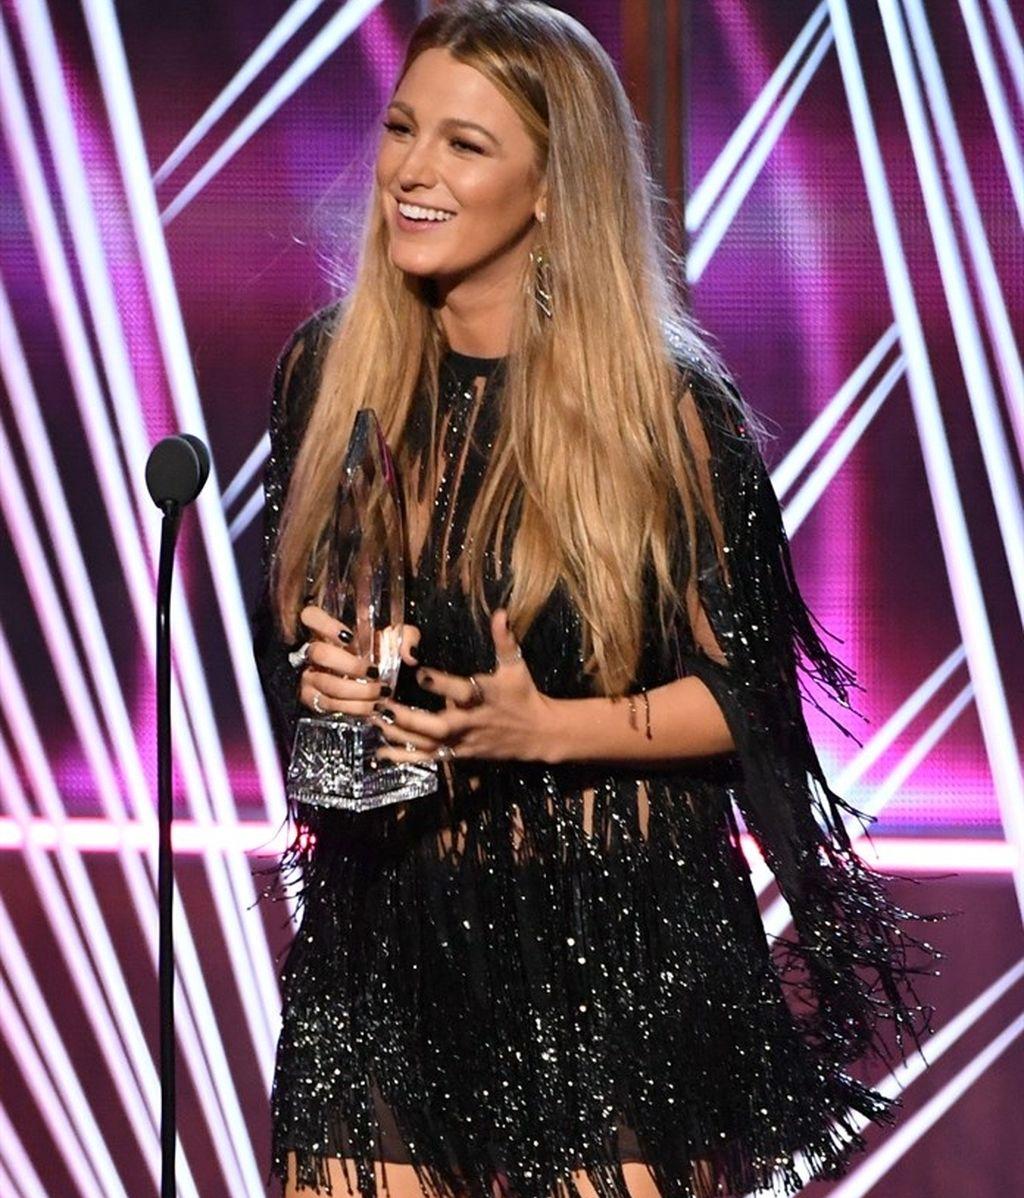 Blake Lively, People's Choice Awards